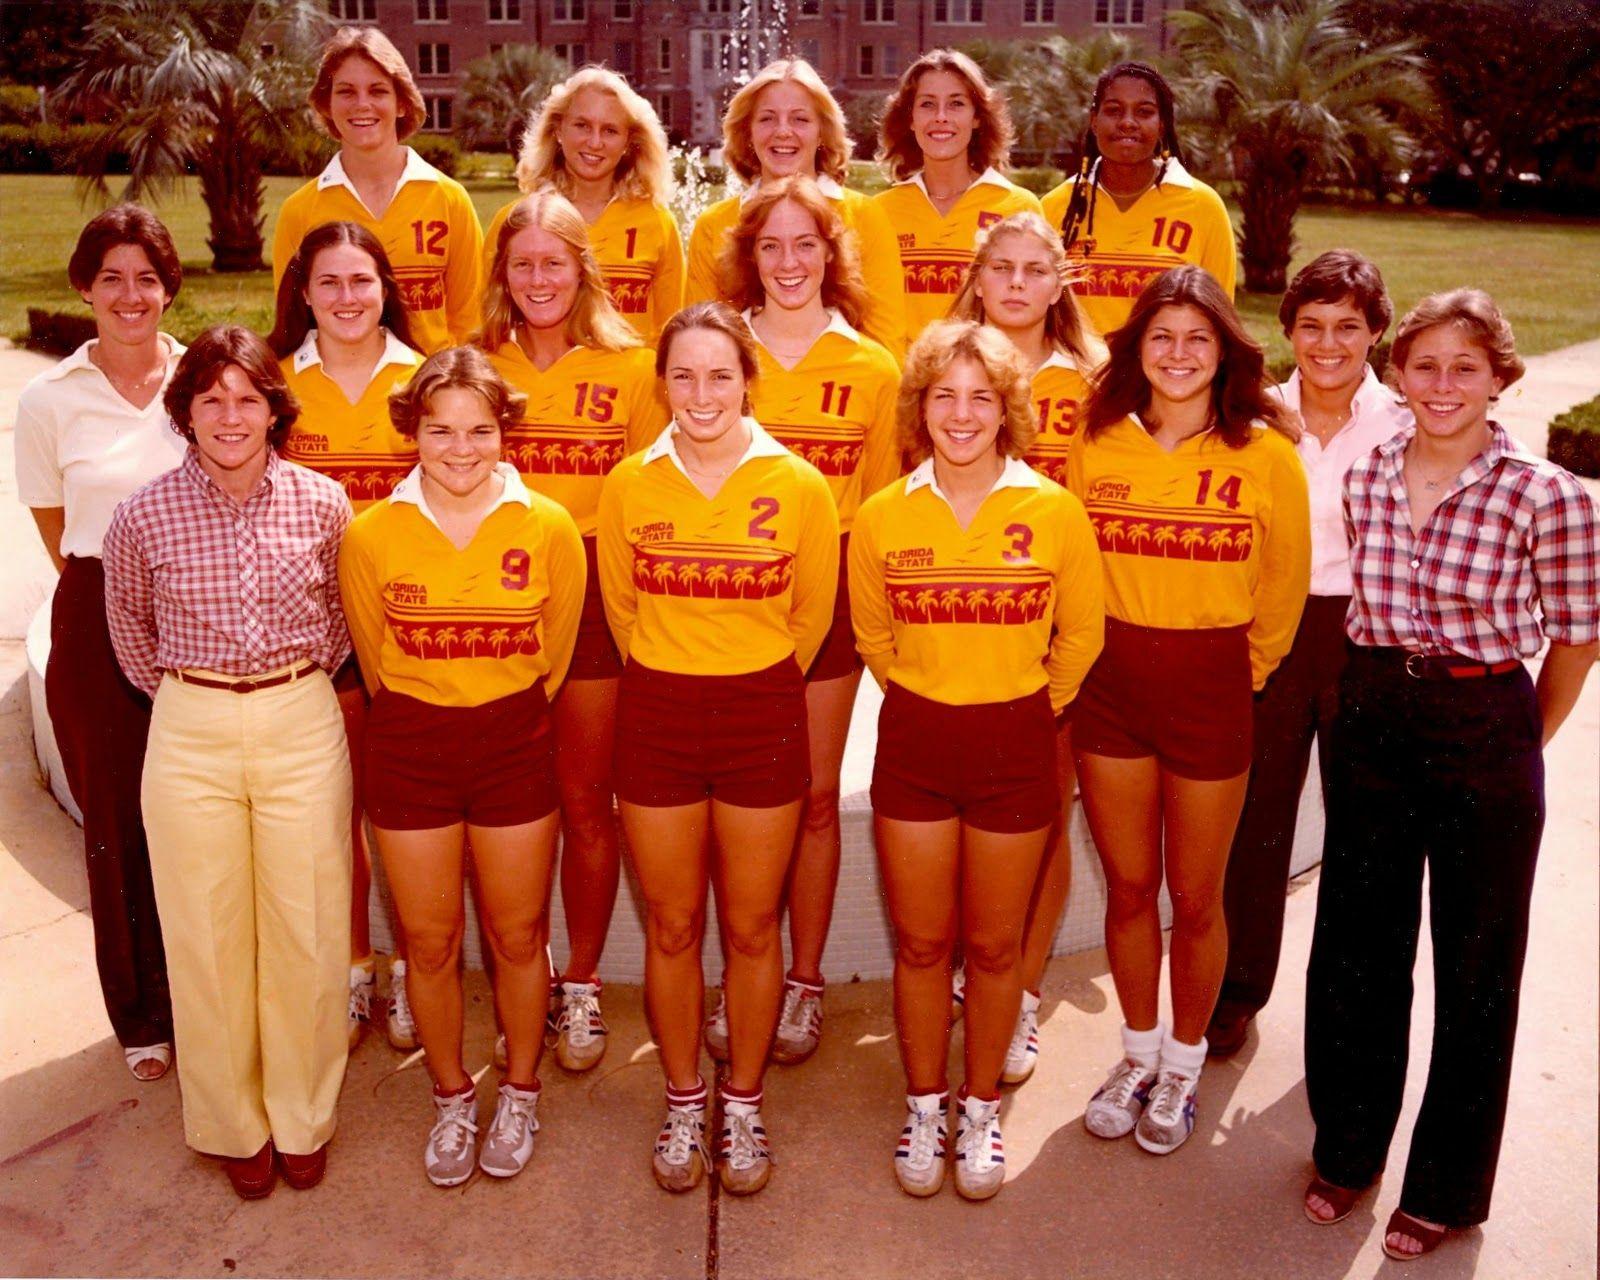 Fsu New Women S Volleyball Uniforms Google Search Volleyball Team Pictures Women Volleyball Volleyball Uniforms